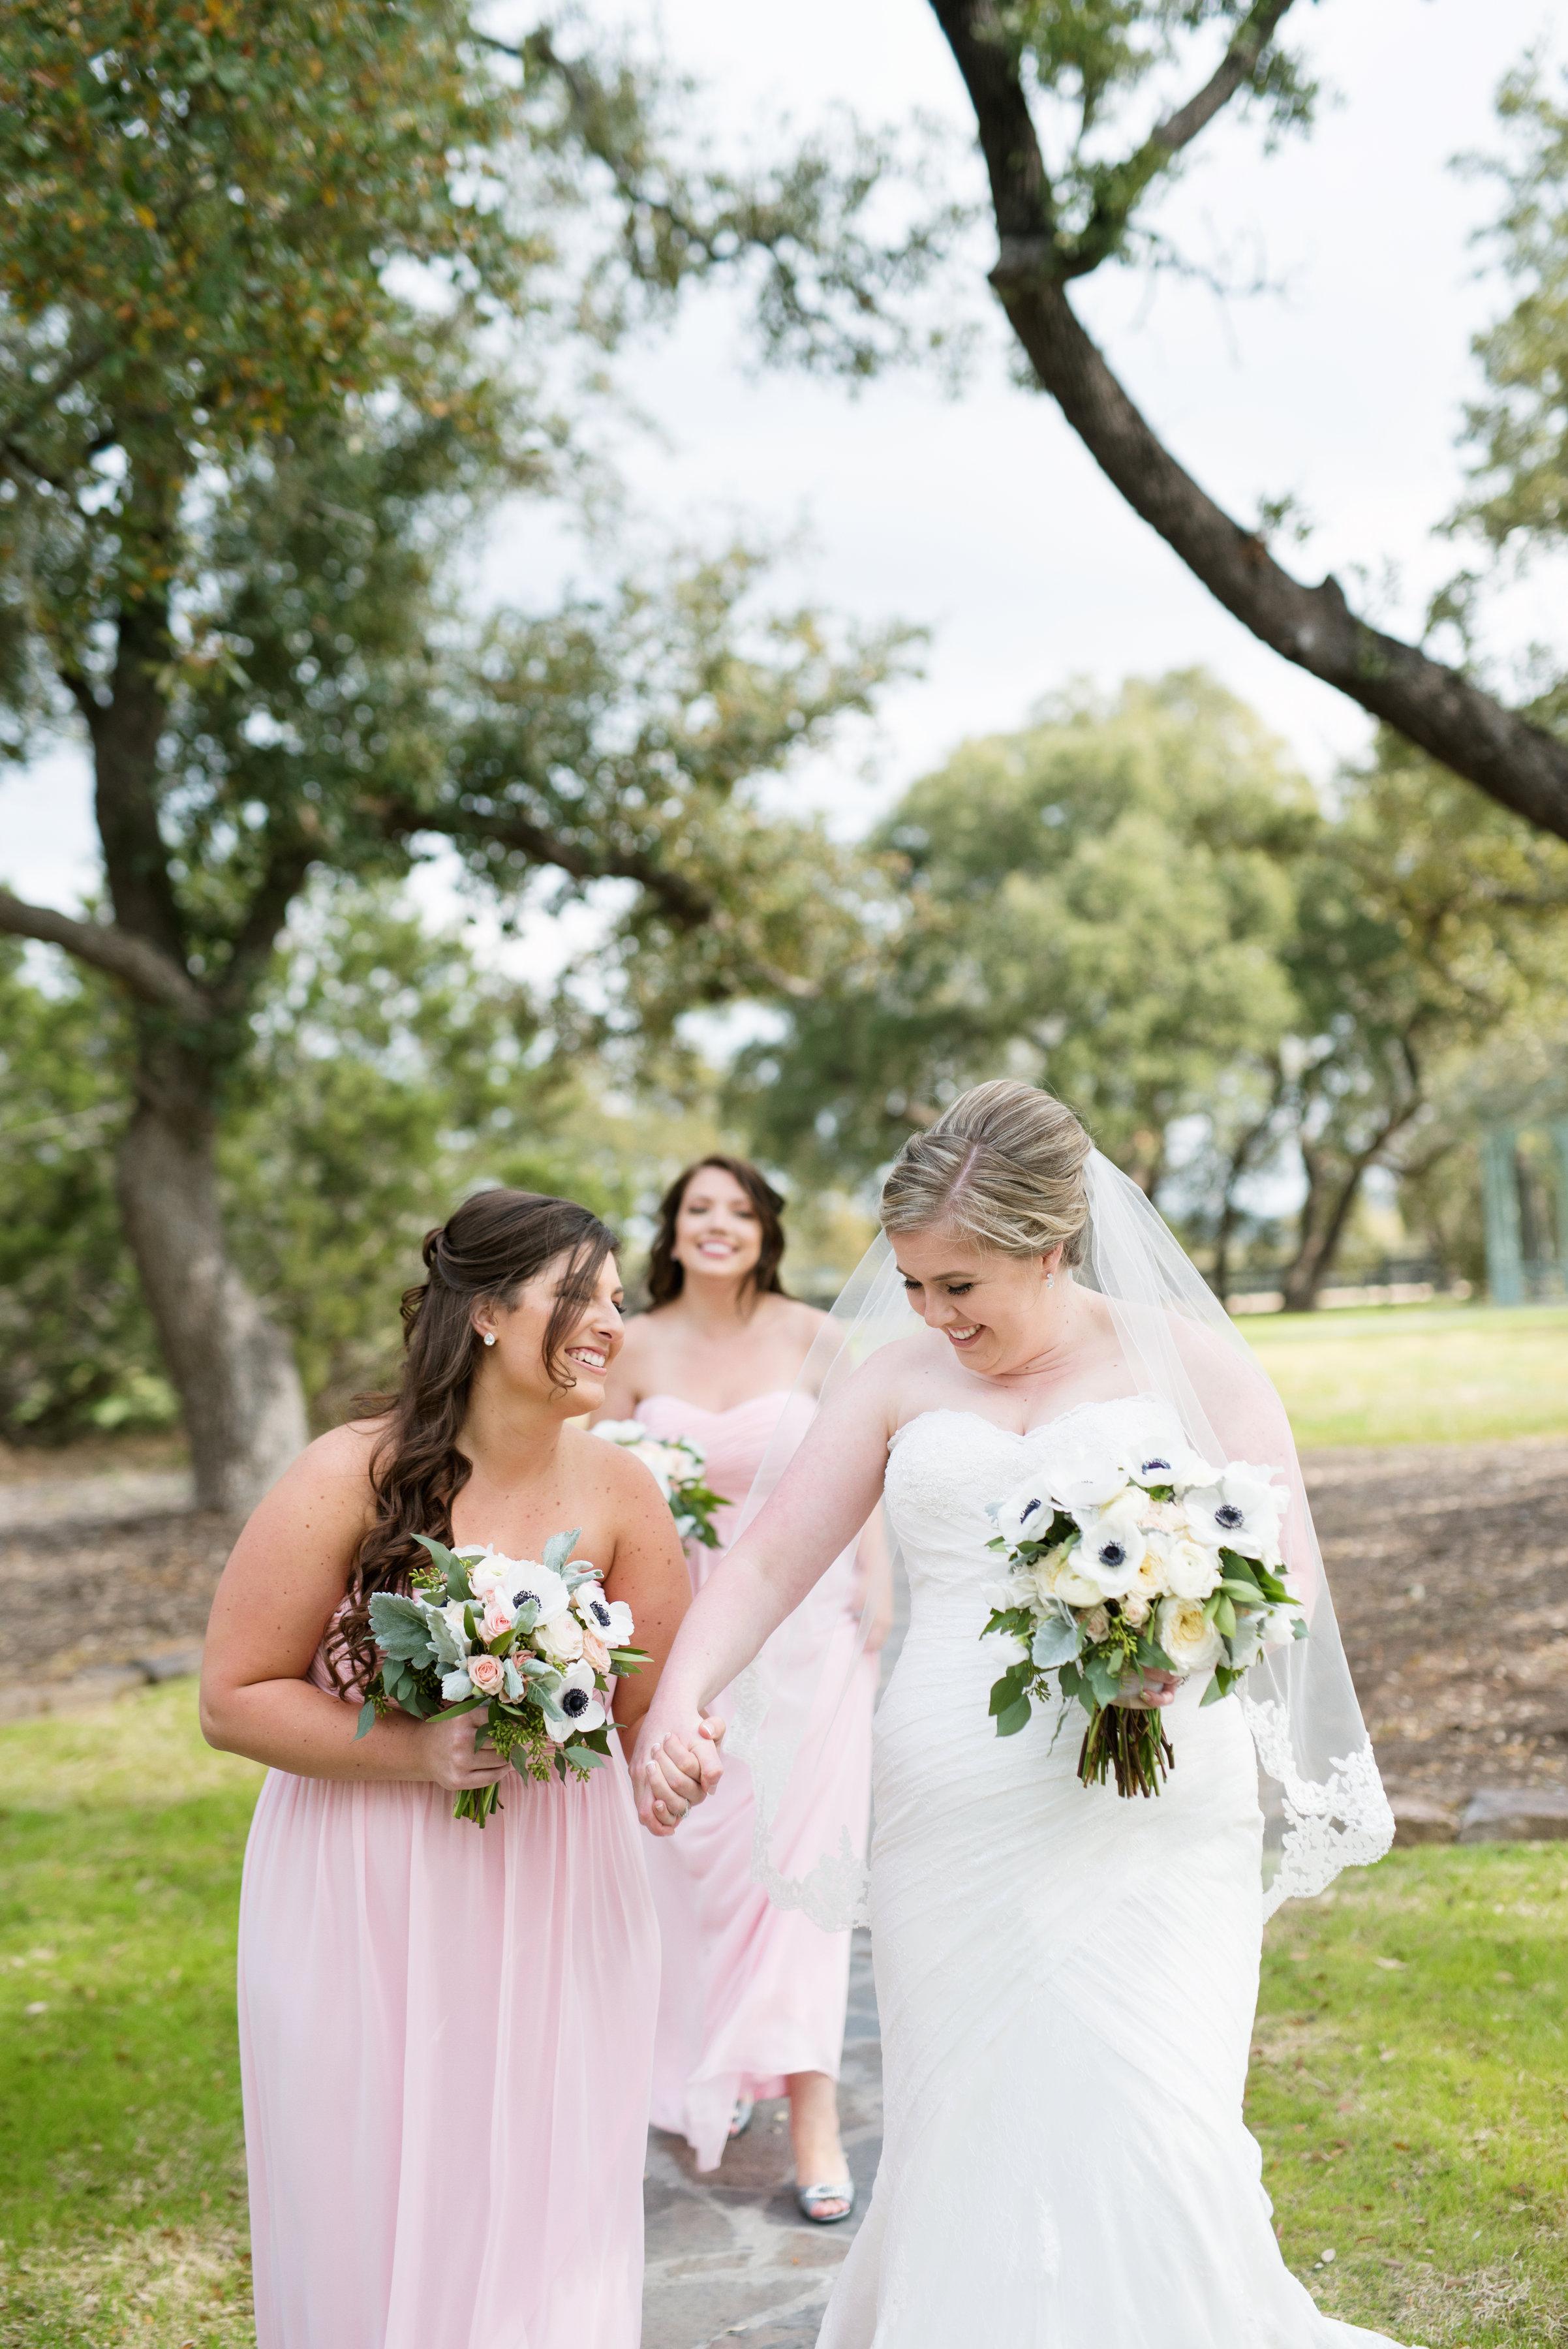 Ma Maison Austin Wedding Venue_ Austin Wedding Planner Heavenly Day Events _ Kristi Wright Austin Wedding Photographer20160306_0118.JPG